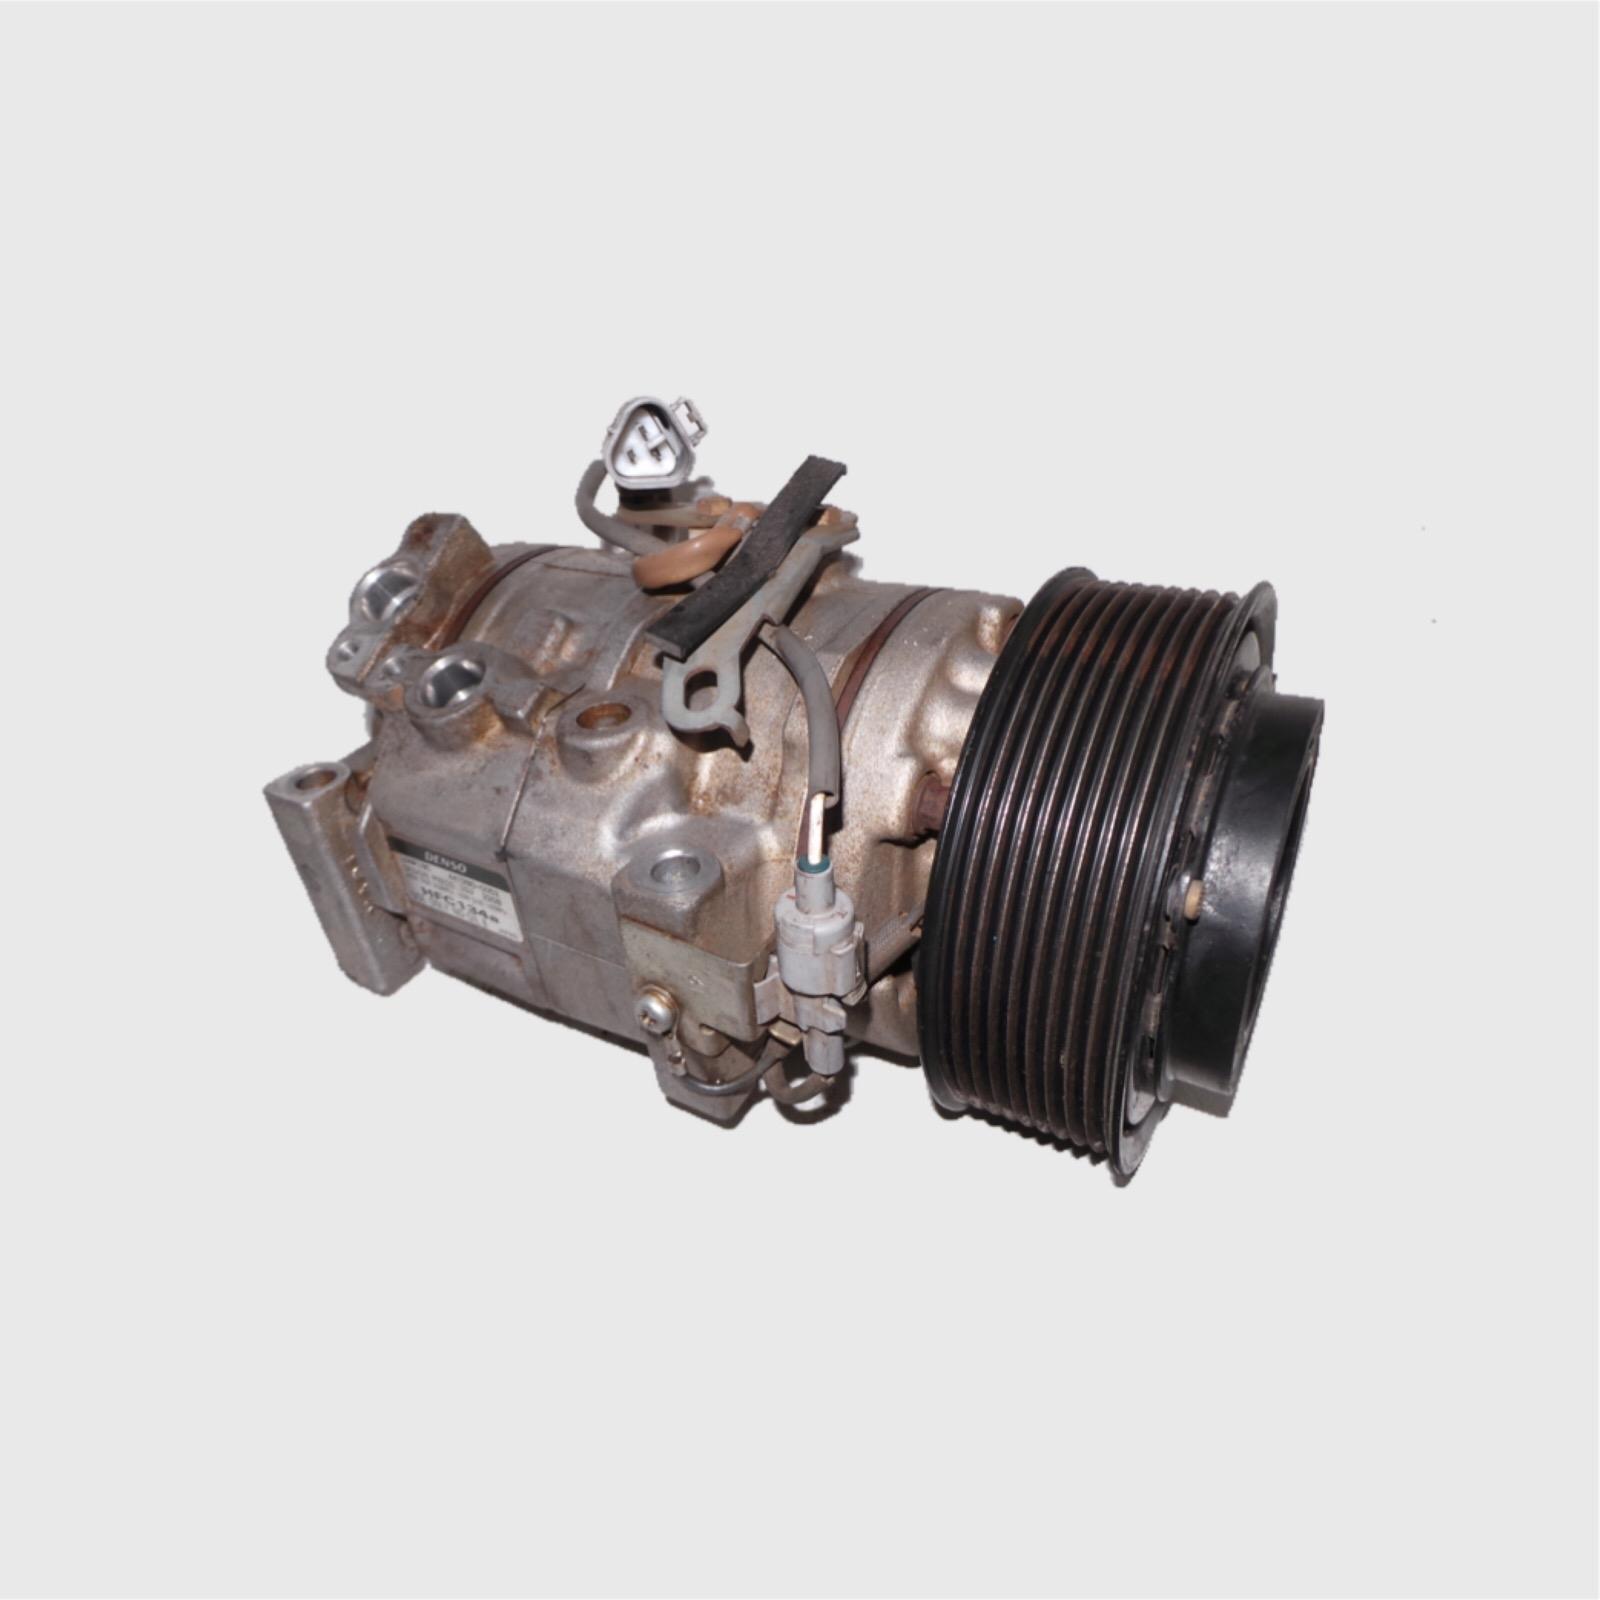 TOYOTA LANDCRUISER, A/C Compressor, 200 SERIES, 4.5, 1VD-FTV, DIESEL, TWIN TURBO, 11/07-